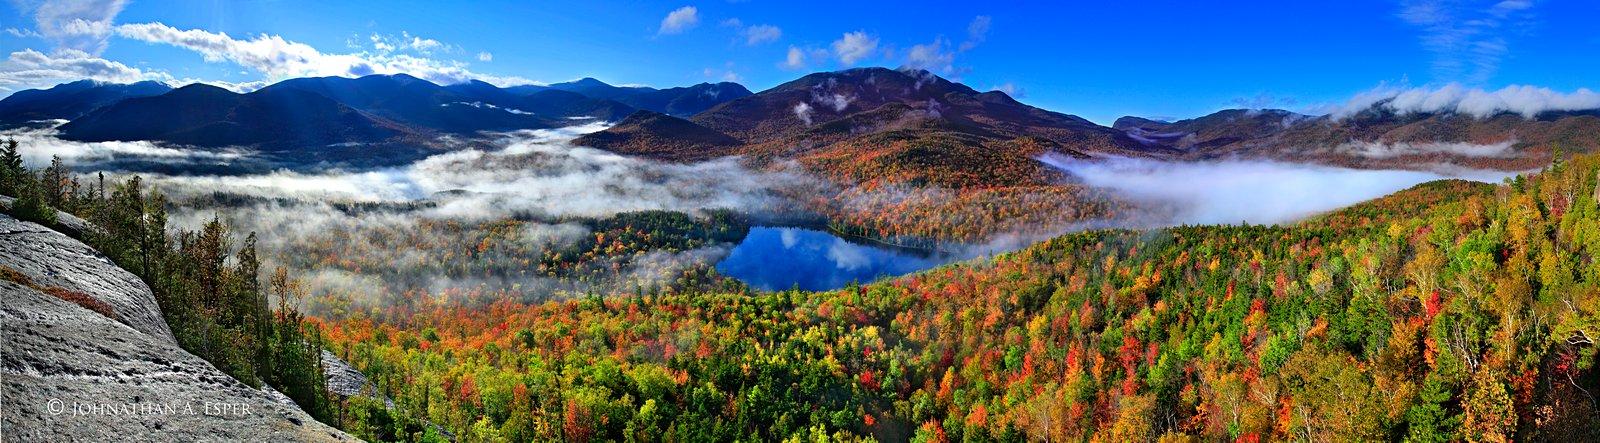 Mt Jo,Mt. Jo,Heart Lake,fall,valley,fog,2011,High Peaks,Adirondack,mountains,panorama,Heart Lake, Mt Jo secret cliffs,autumn,Adirondack High Peaks, photo